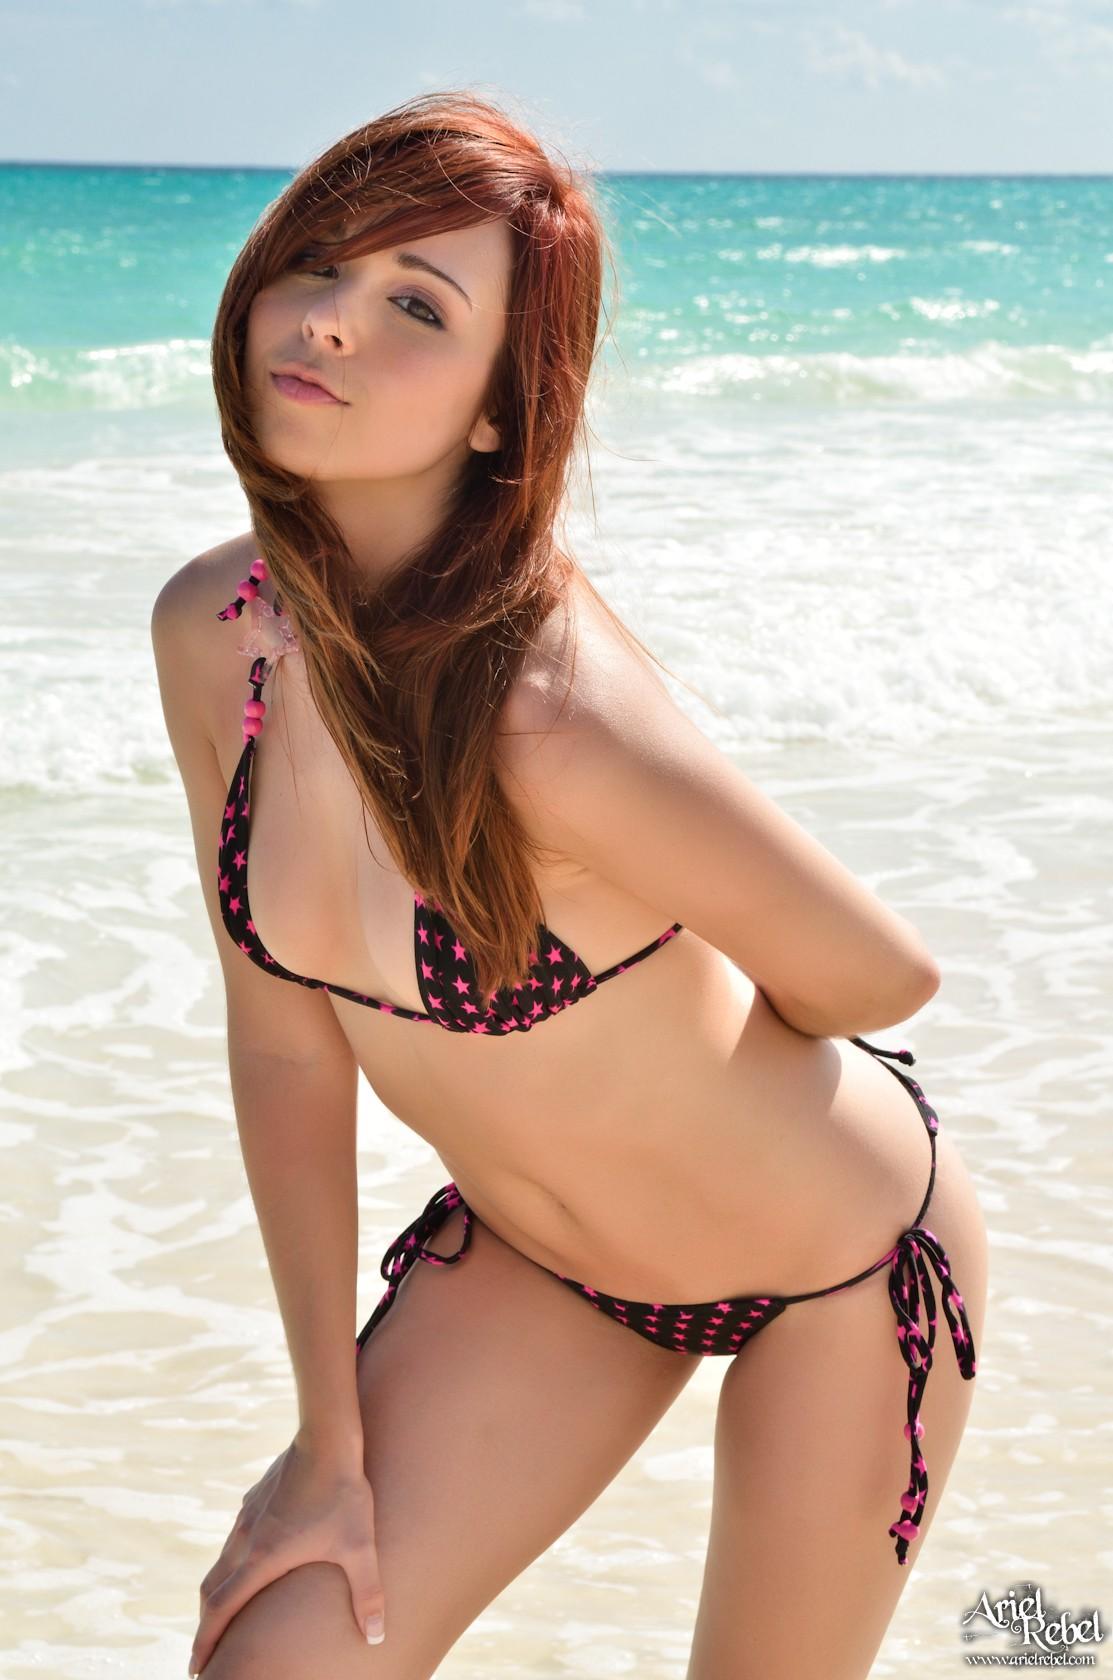 nude beach rebel Ariel